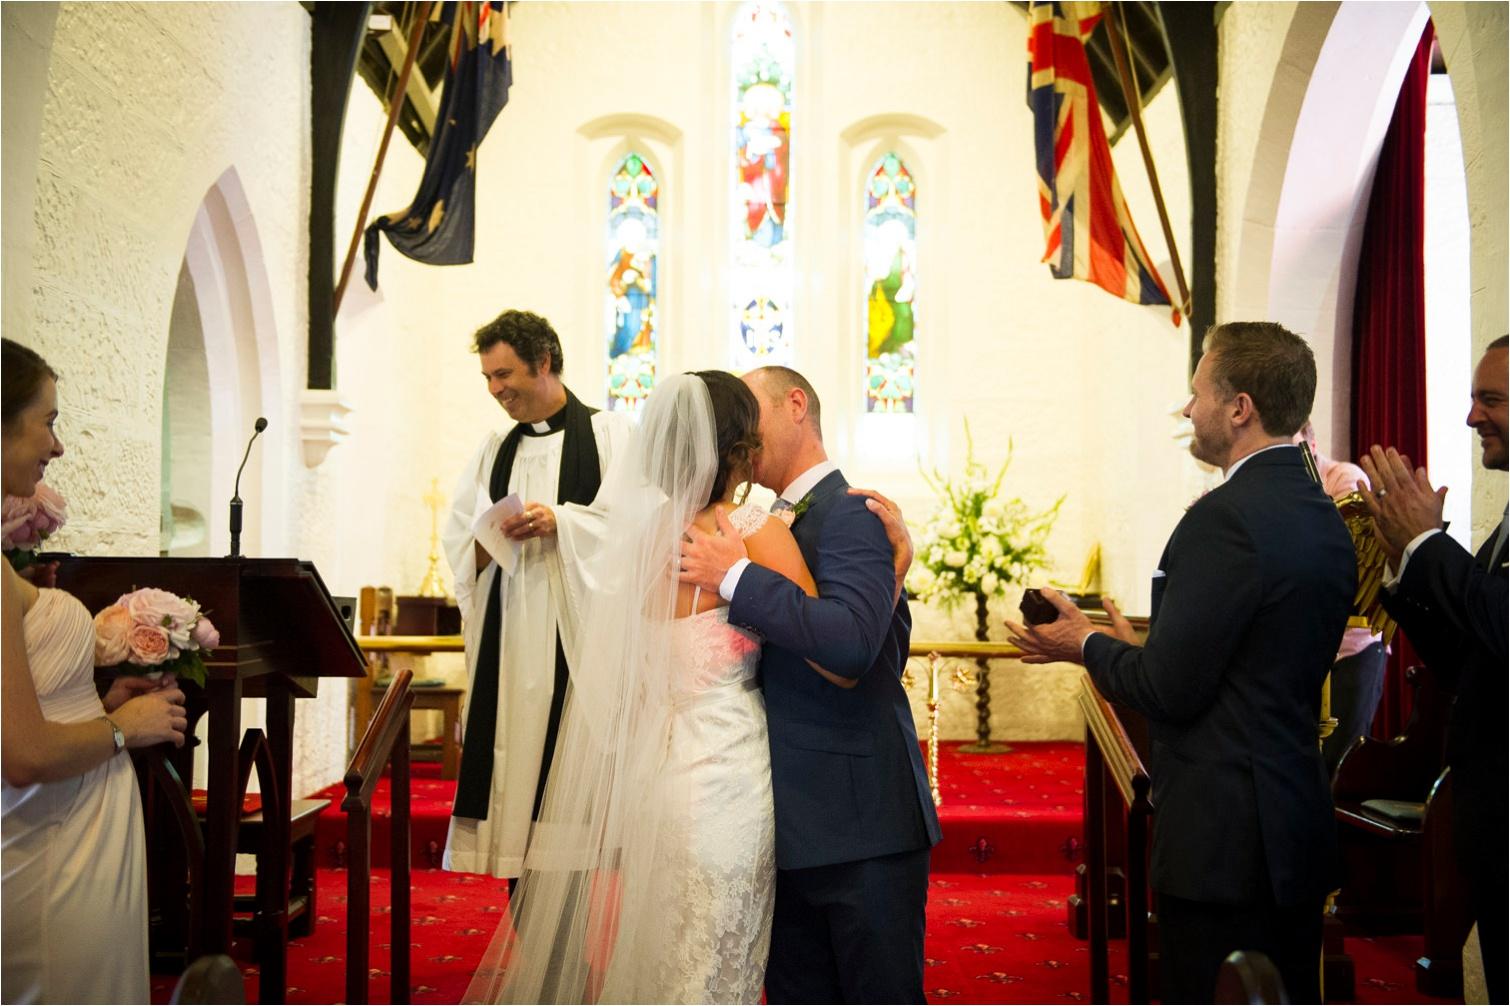 Nicole&Carlie_Watsons_Bay_Hotel_Wedding_by_Gold_Coast_Photographers-The_Follans21.jpg